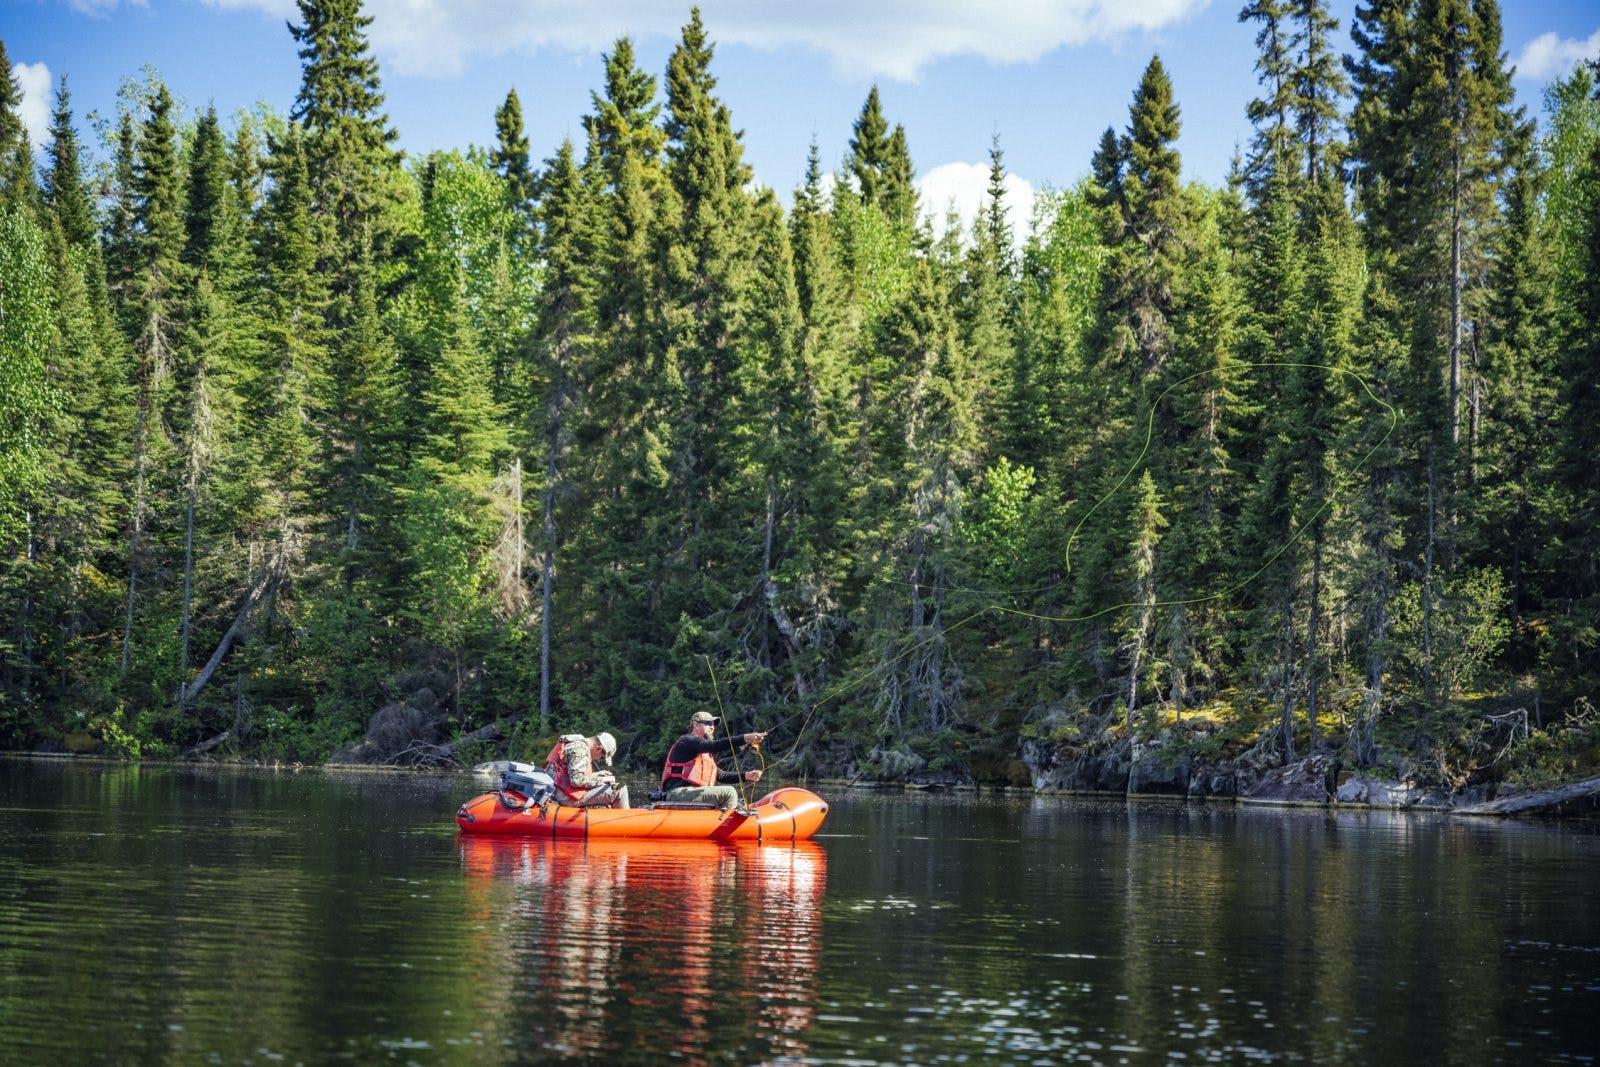 Fly fishing in the Oryx Packraft Canoe in the Boundary Waters. 📸: Jeremiah Watt.